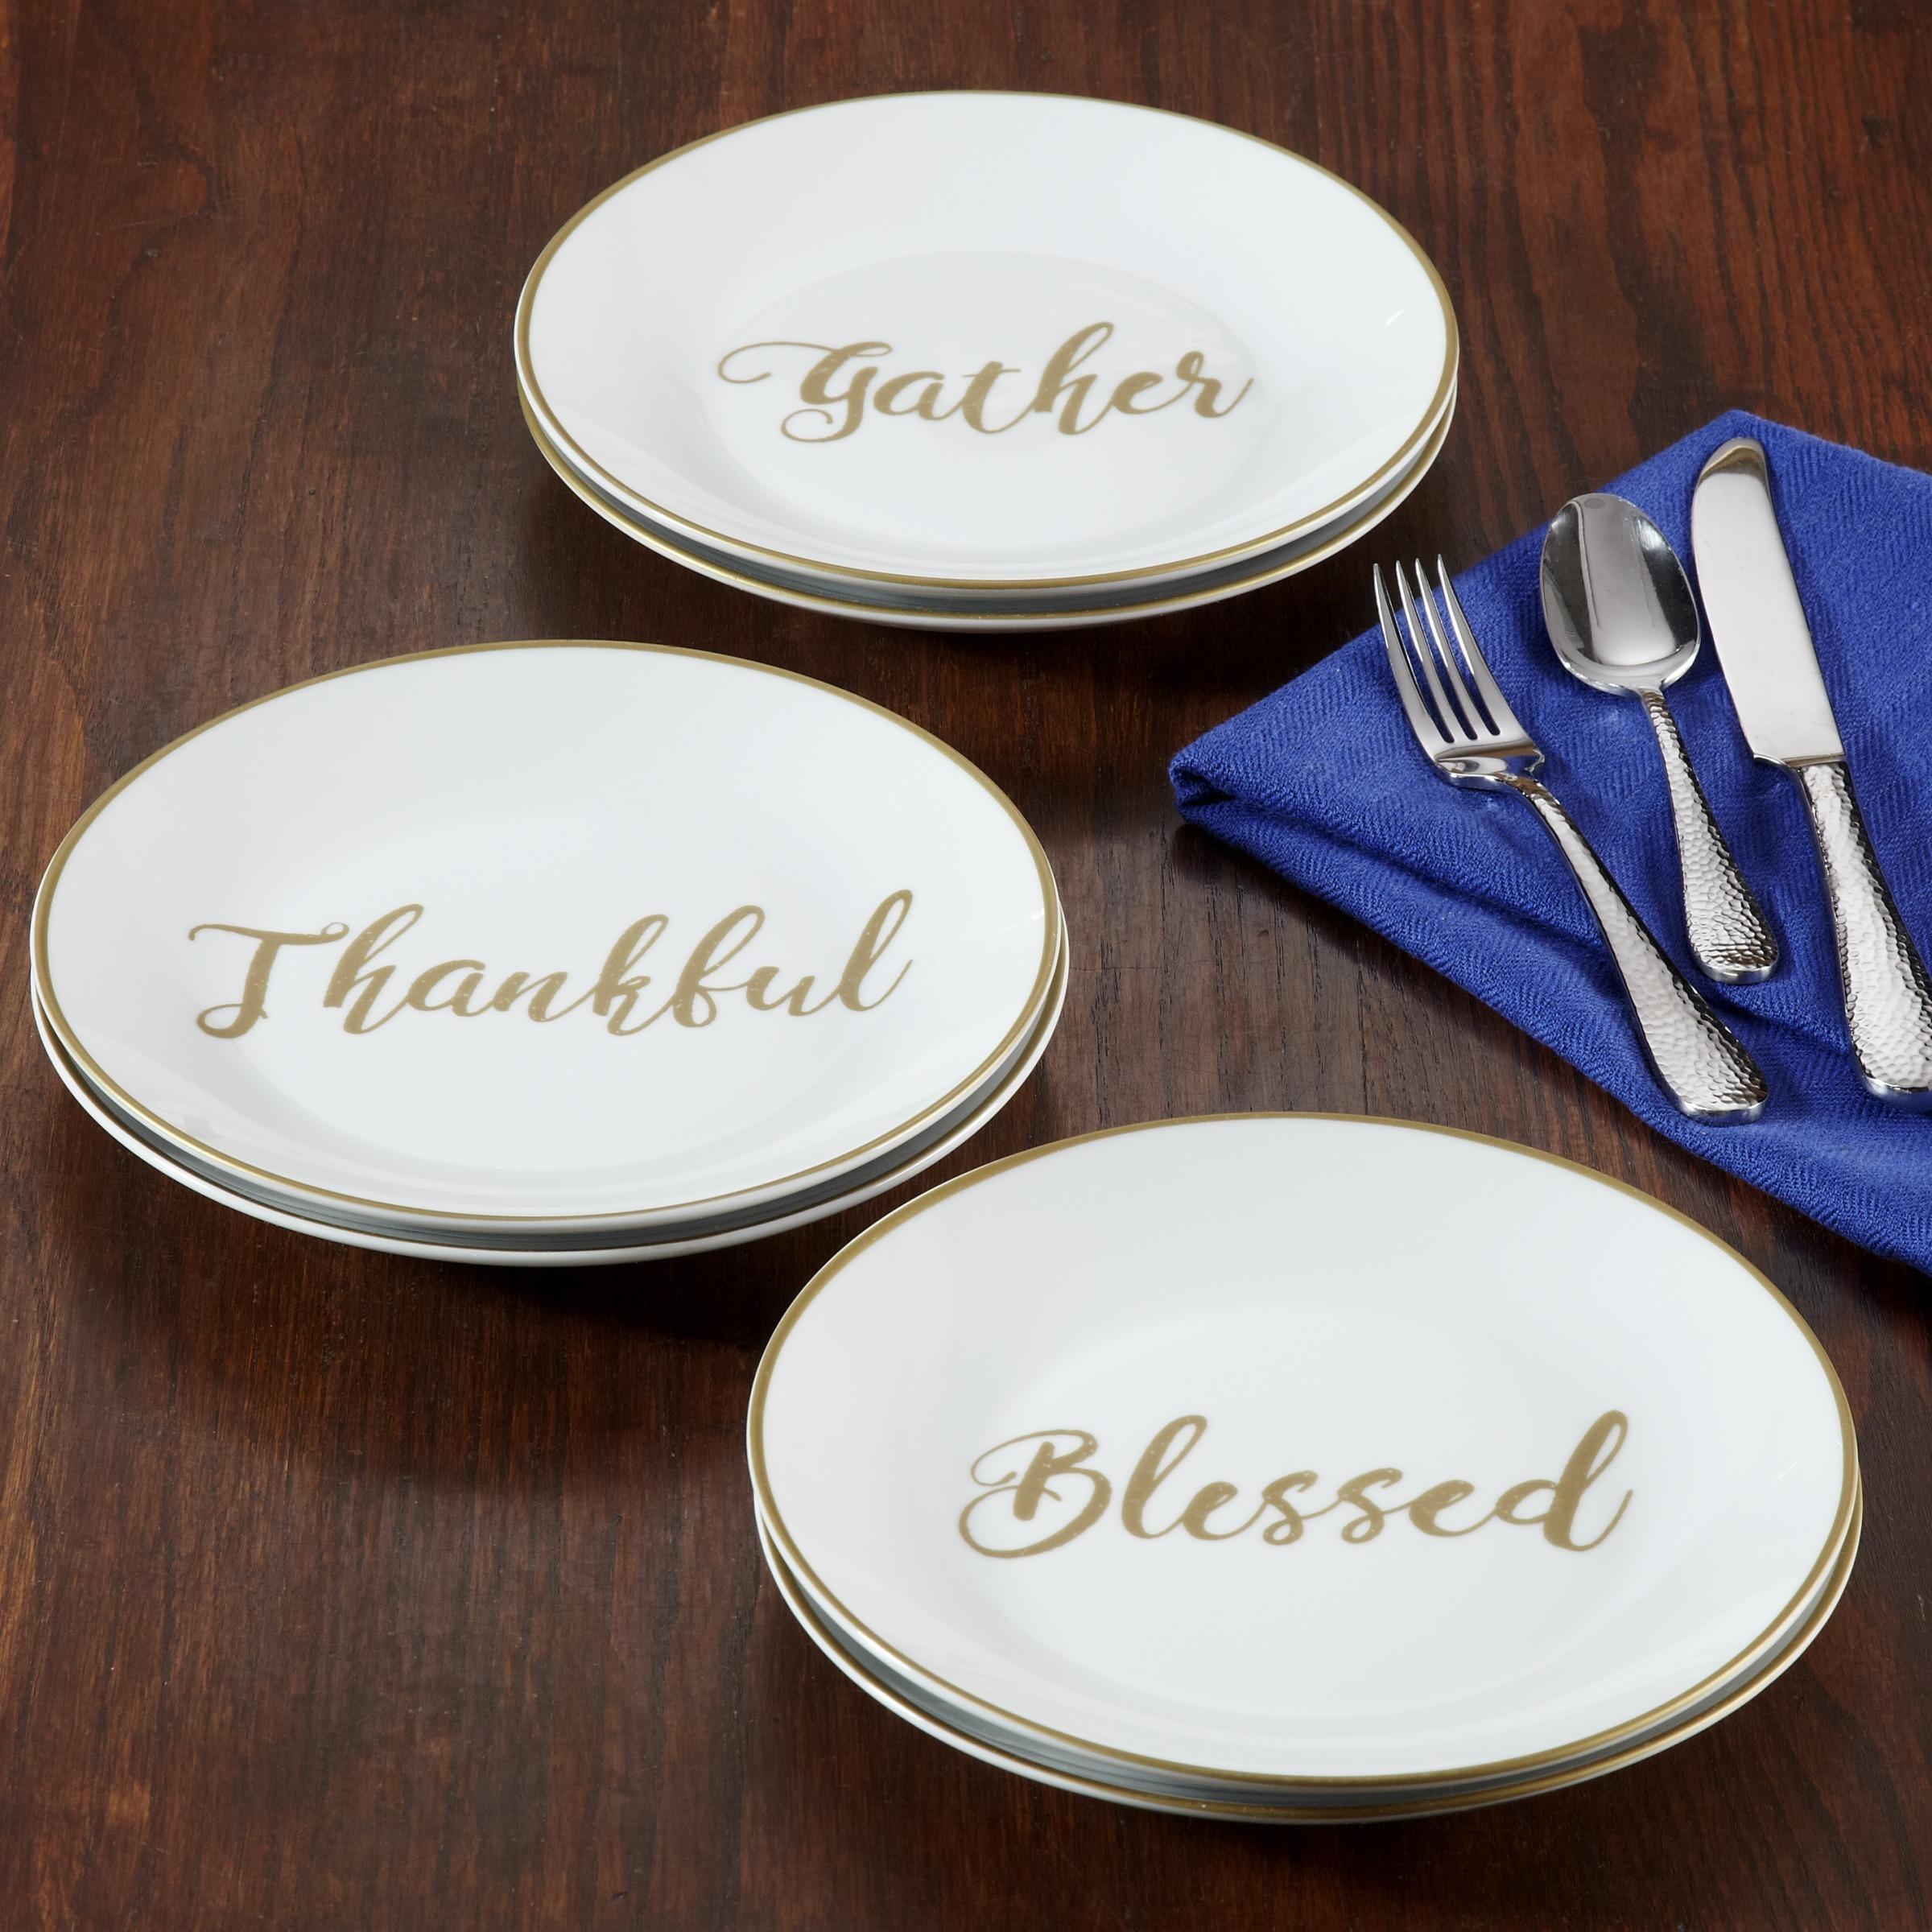 Thankful dessert plates.jpeg